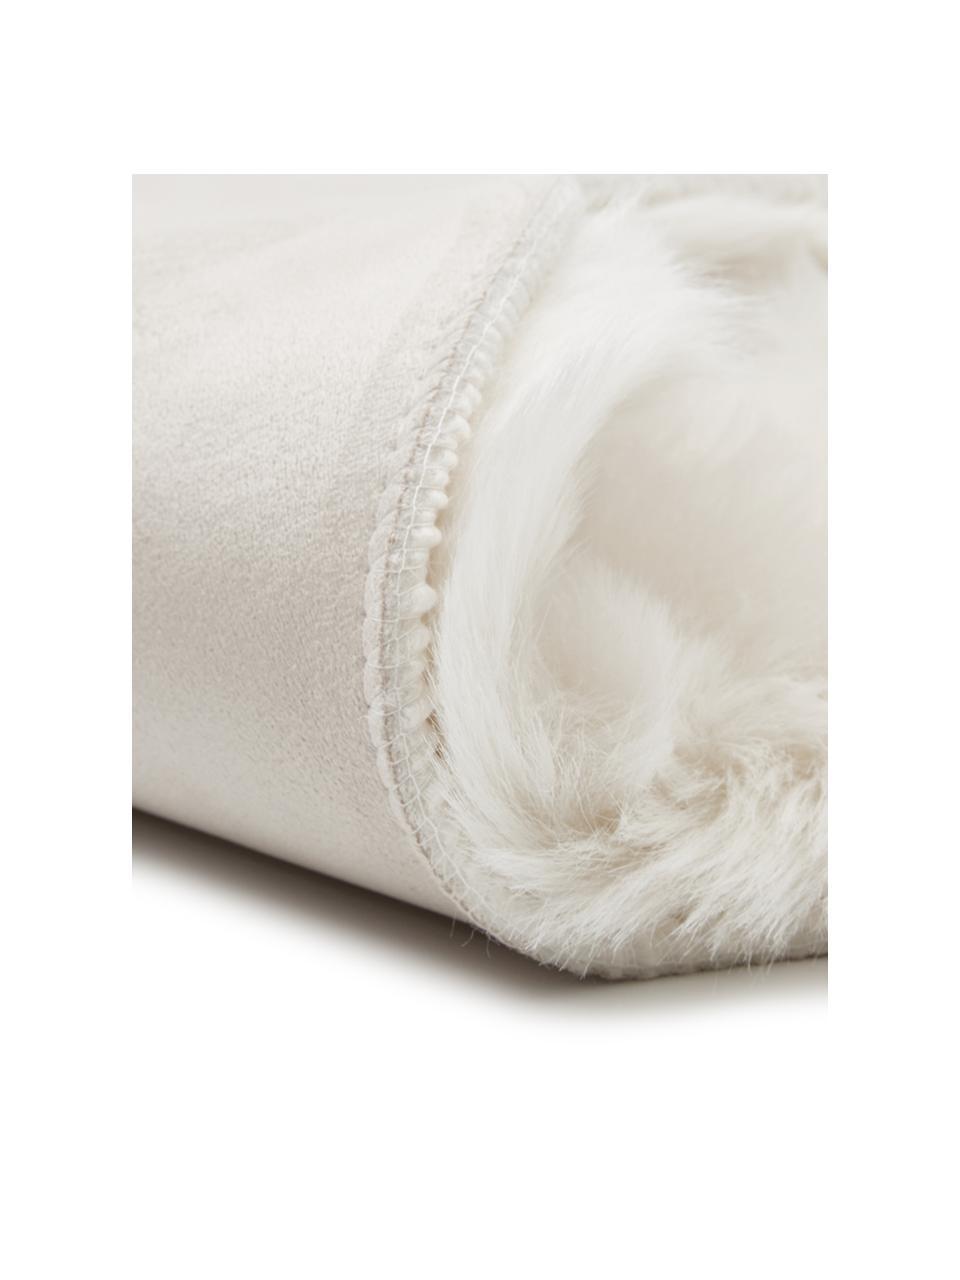 Kunstfell Mathilde, glatt, Vorderseite: 65% Acryl, 35% Polyester, Rückseite: 100% Polyester, Creme, 60 x 90 cm